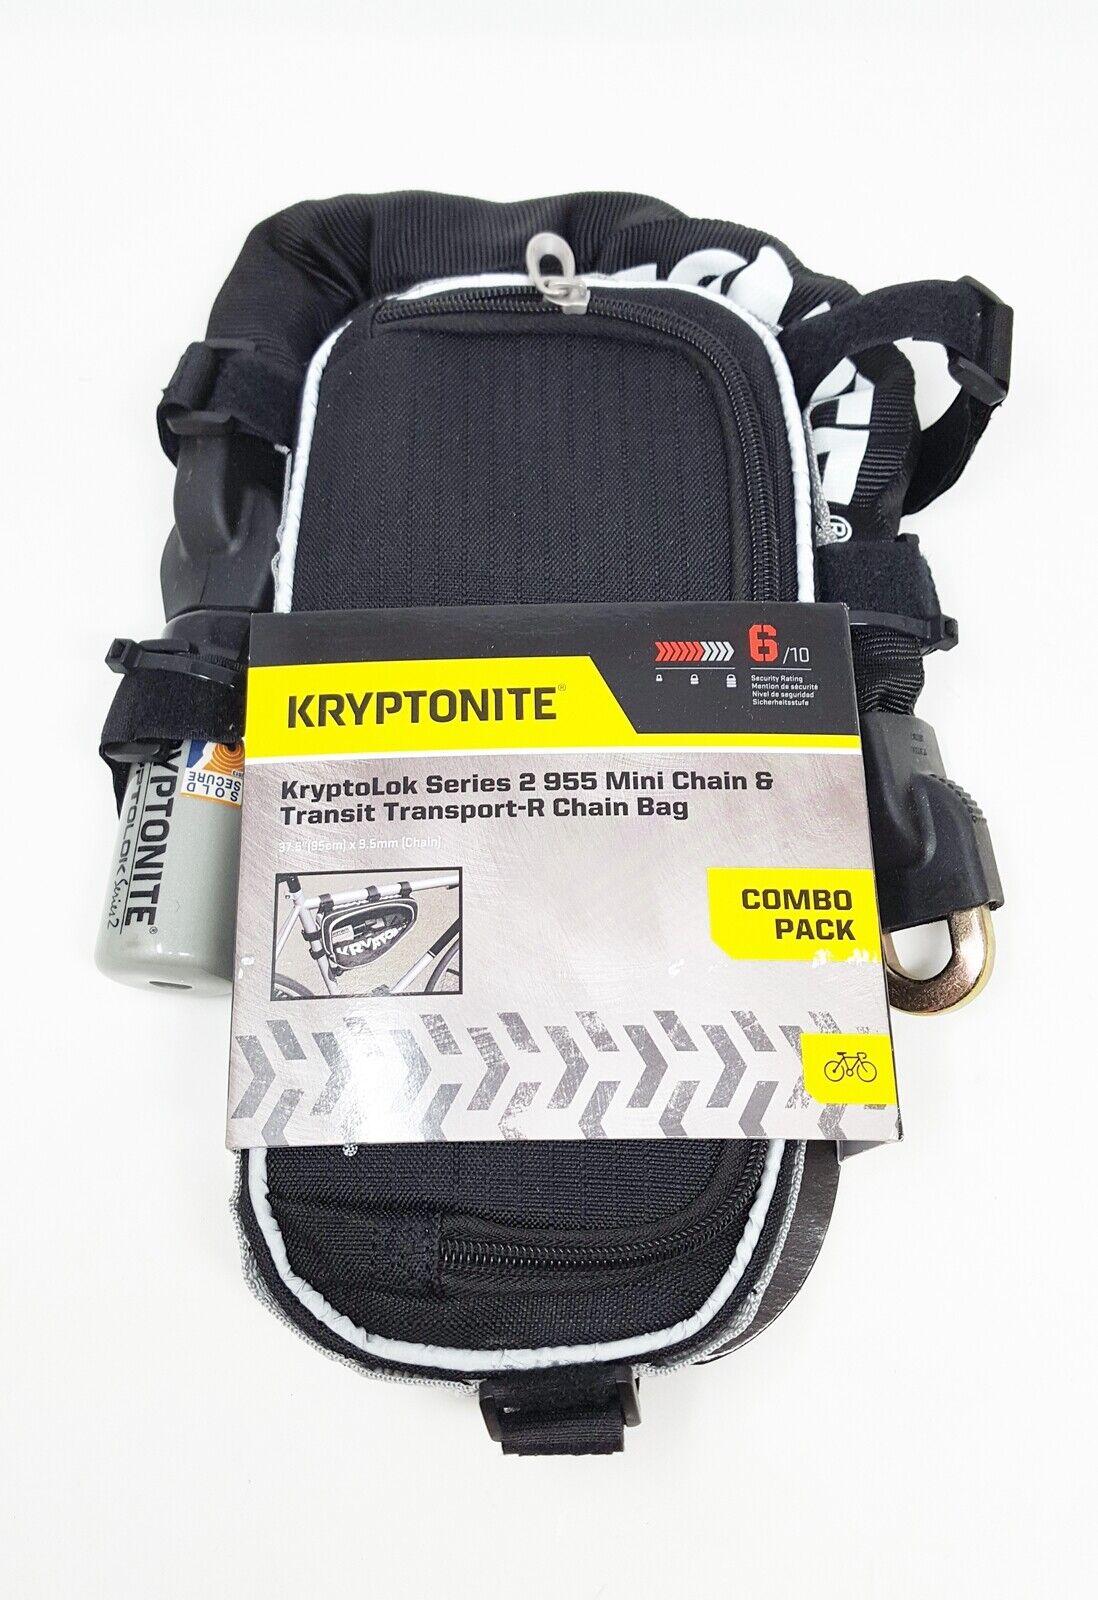 Kryptonite KryptoLok Series-2 955 Mini Integrated Chain Bicy